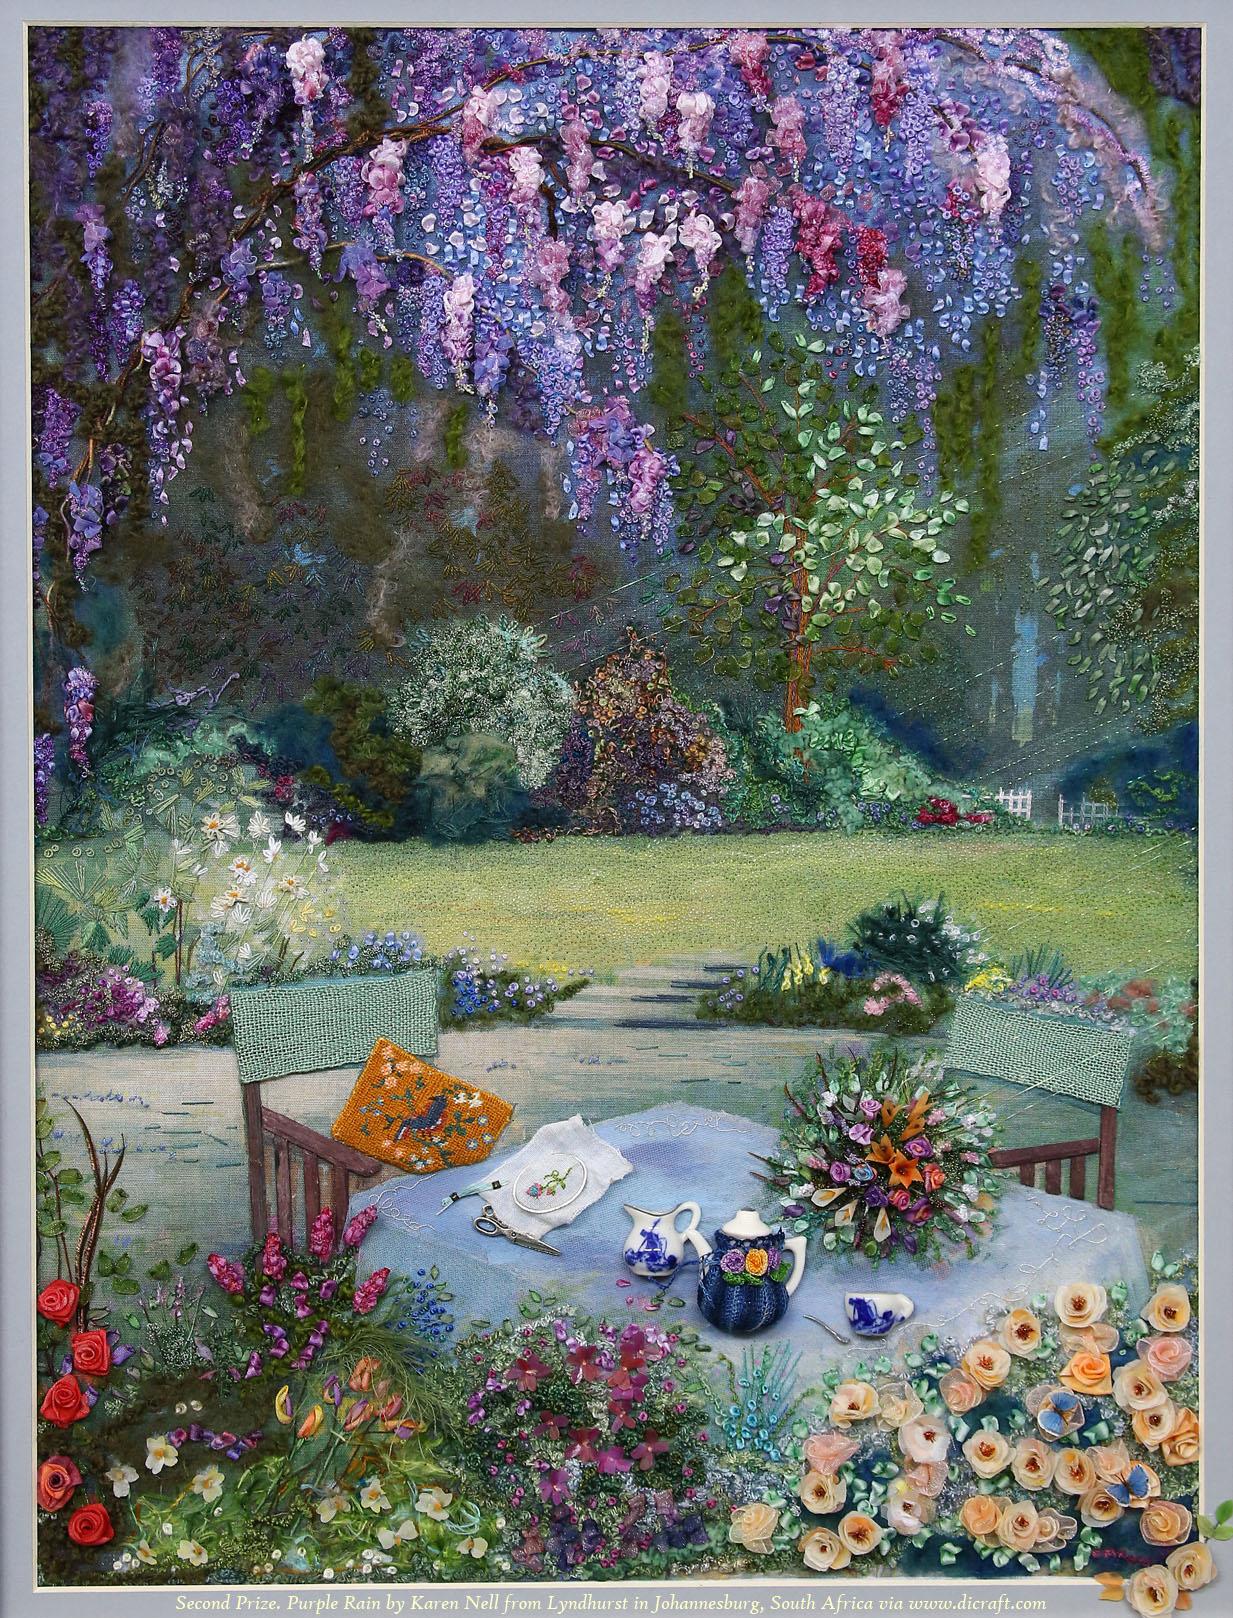 Karen-Nell-Purple-Rain